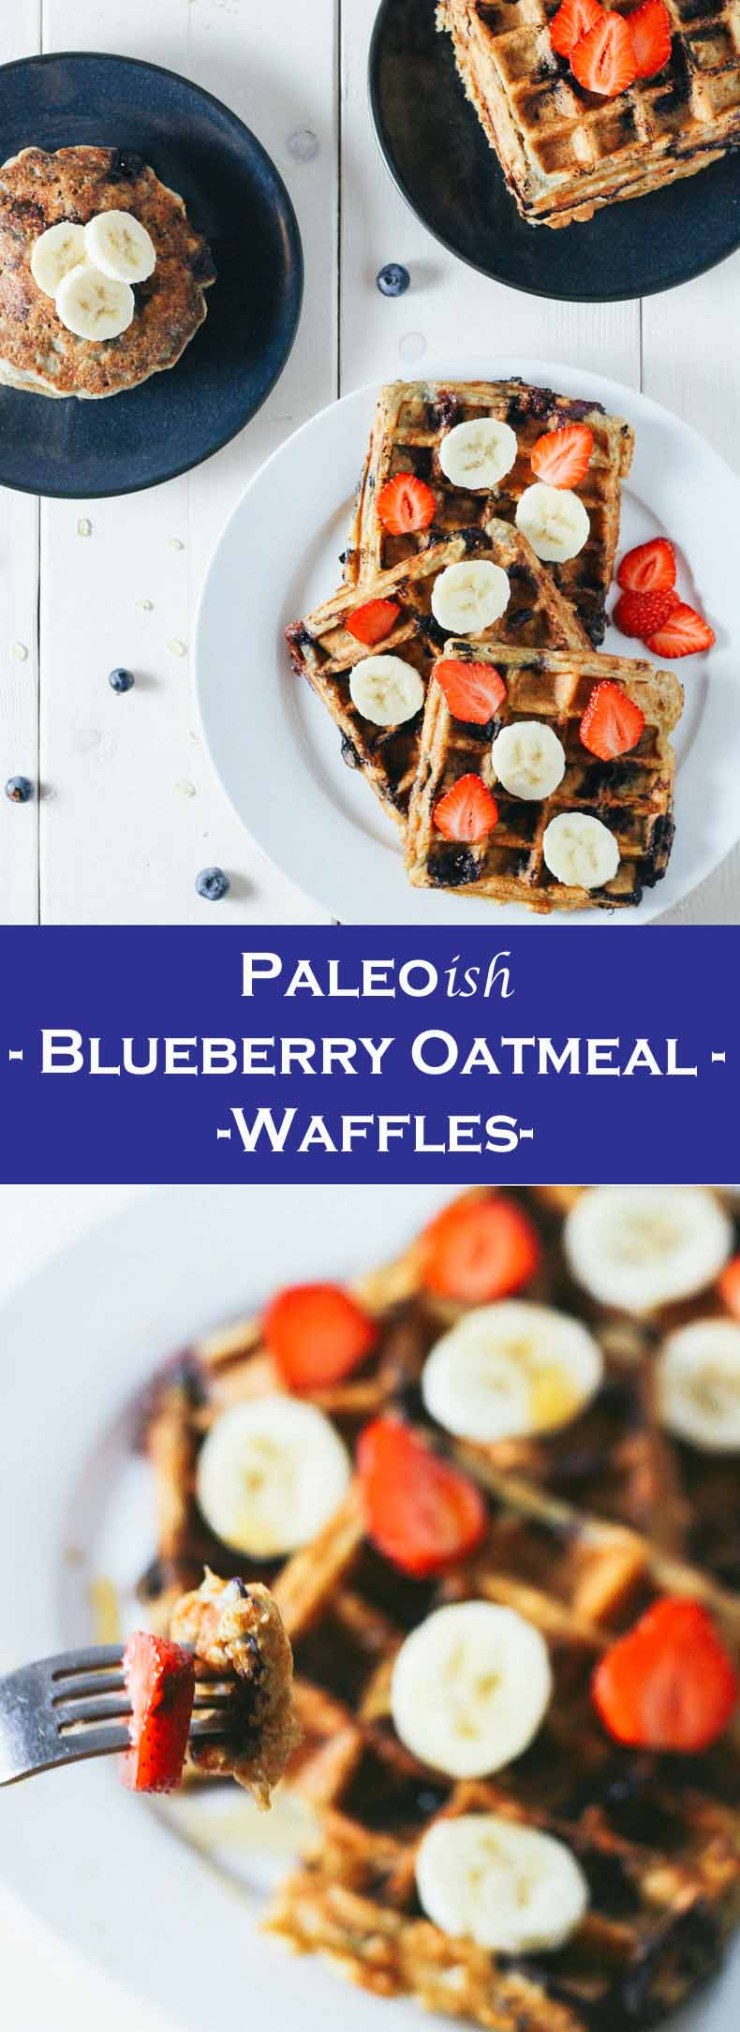 Paleo-ish Blueberry Oatmeal Waffles Long Pin